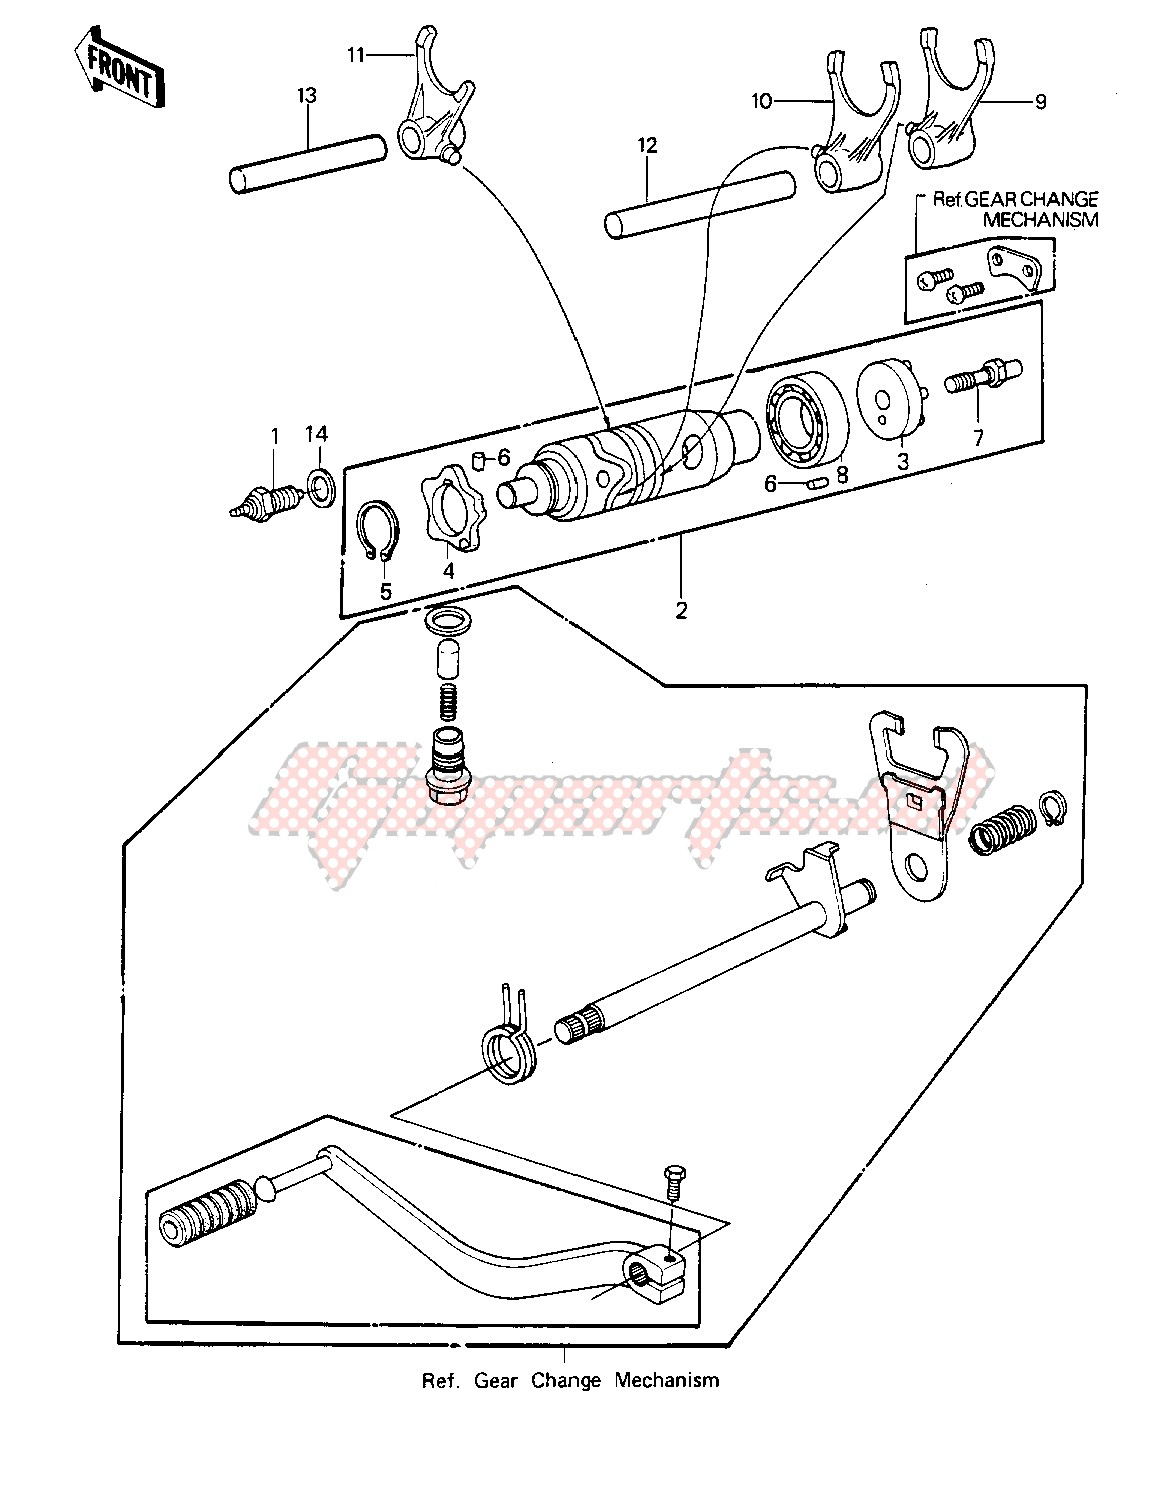 GEAR CHANGE DRUM & FORKS -- 81-82 KLT200-A1_A2_A3- - image